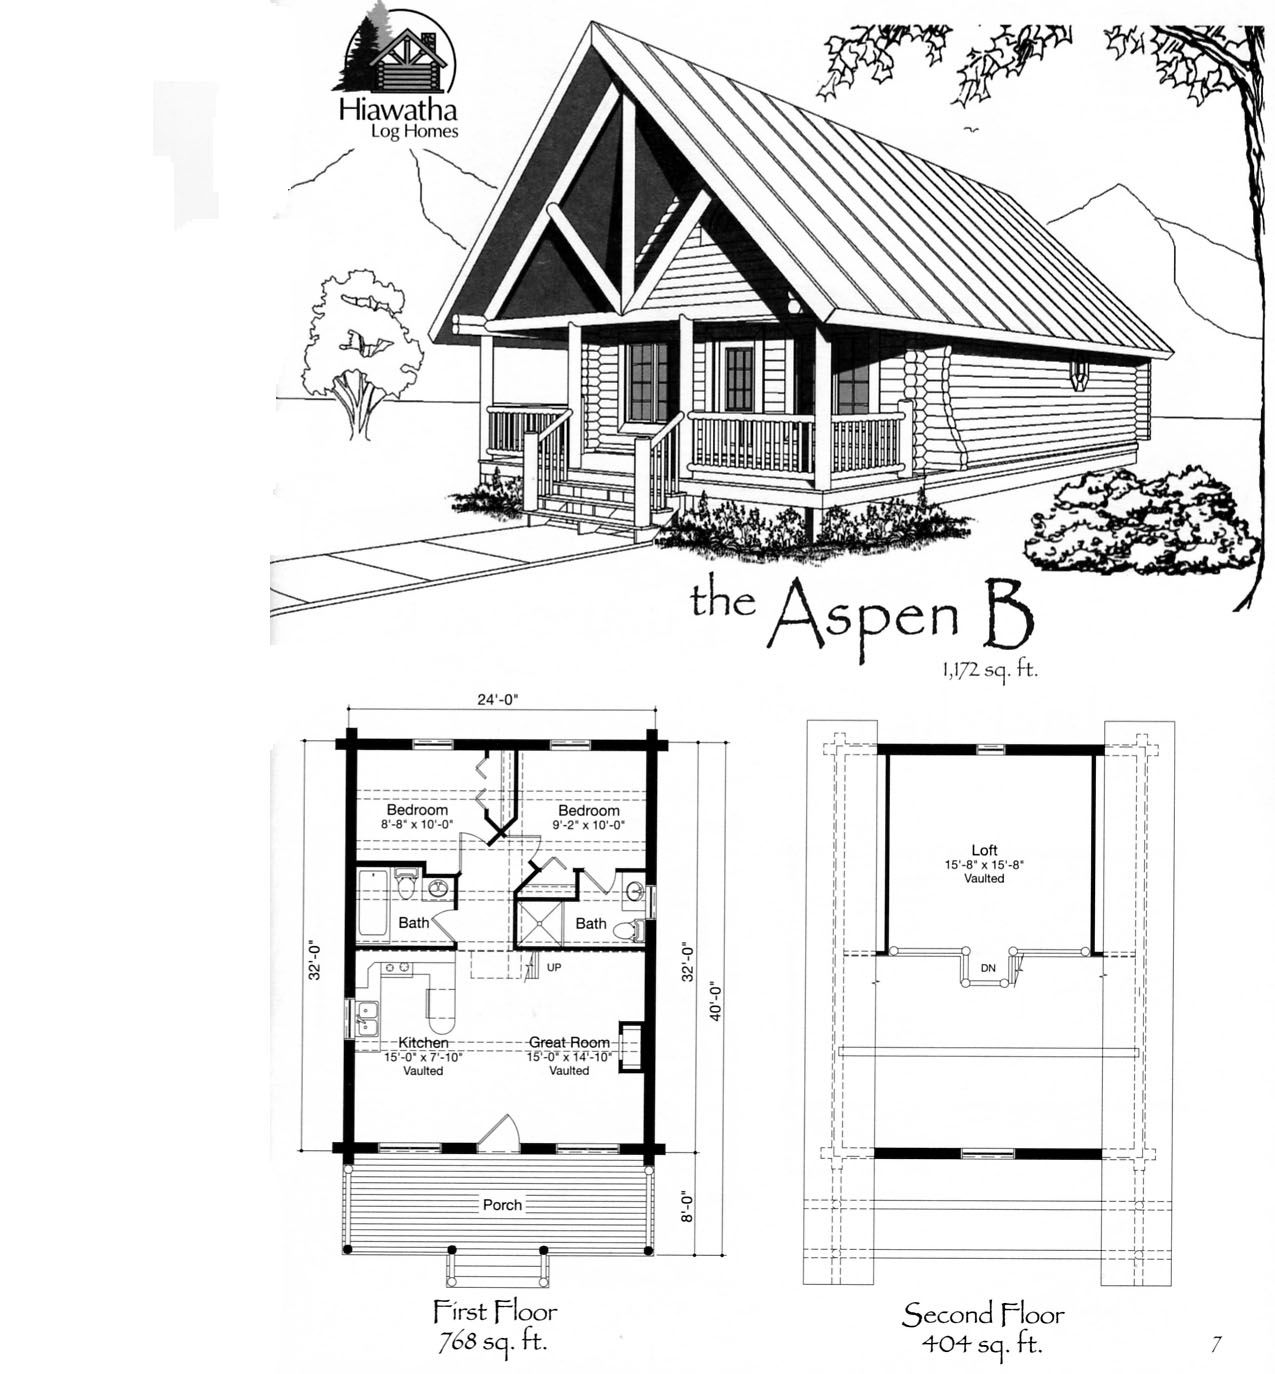 Terrific 17 Best Images About Floor Plans On Pinterest Largest Home Design Picture Inspirations Pitcheantrous